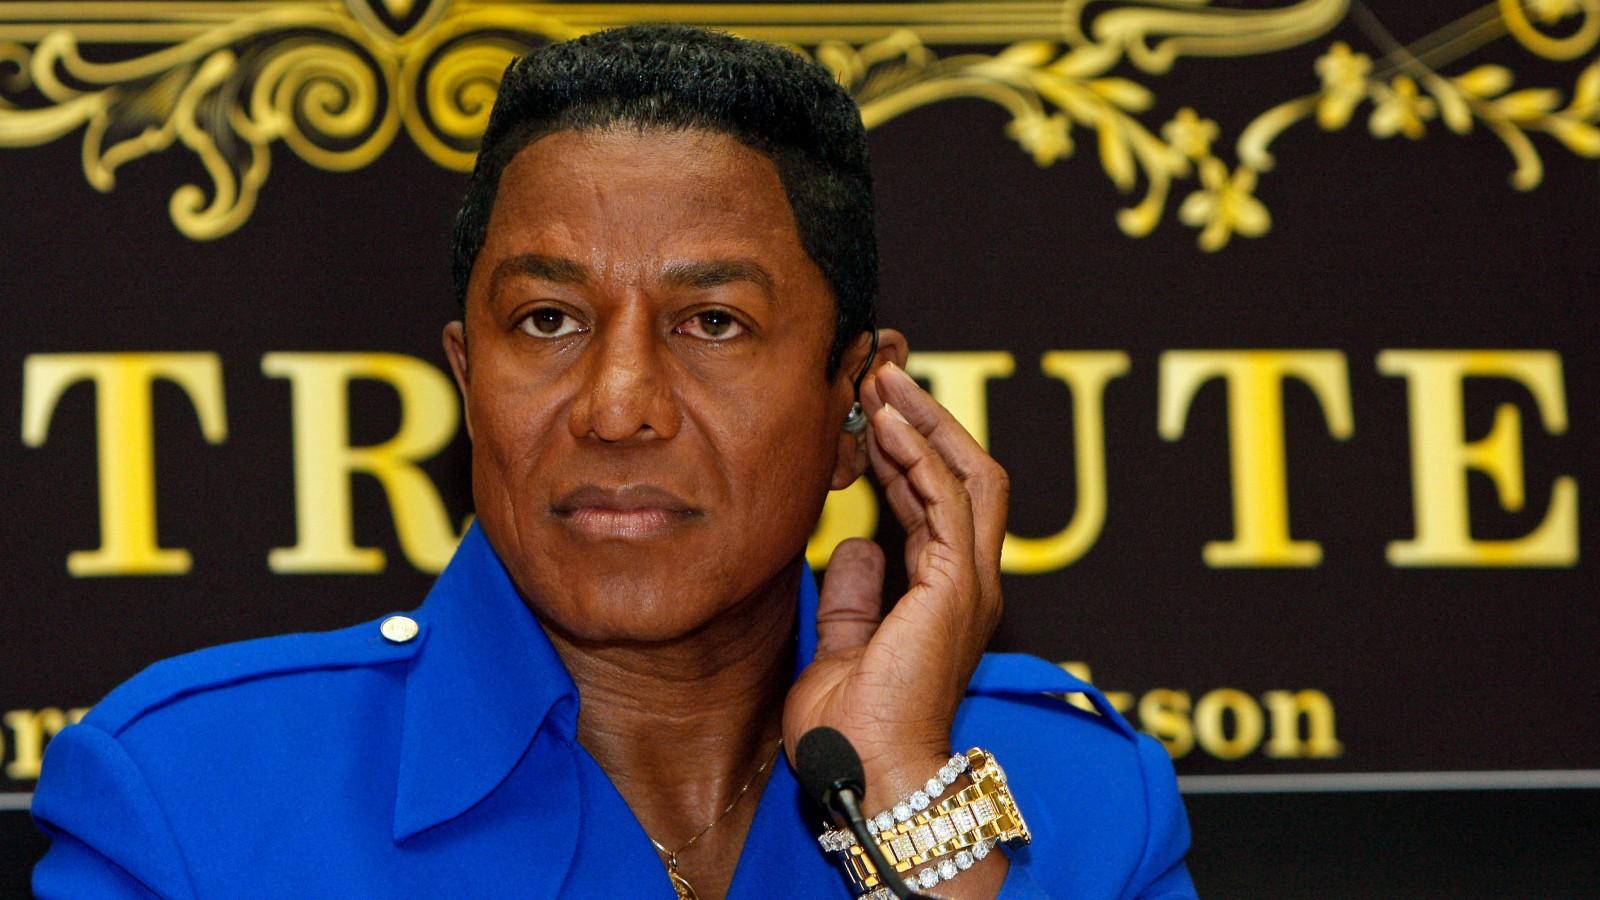 Jermaine Jackson Unhappy With Michael Jackson 39 S New